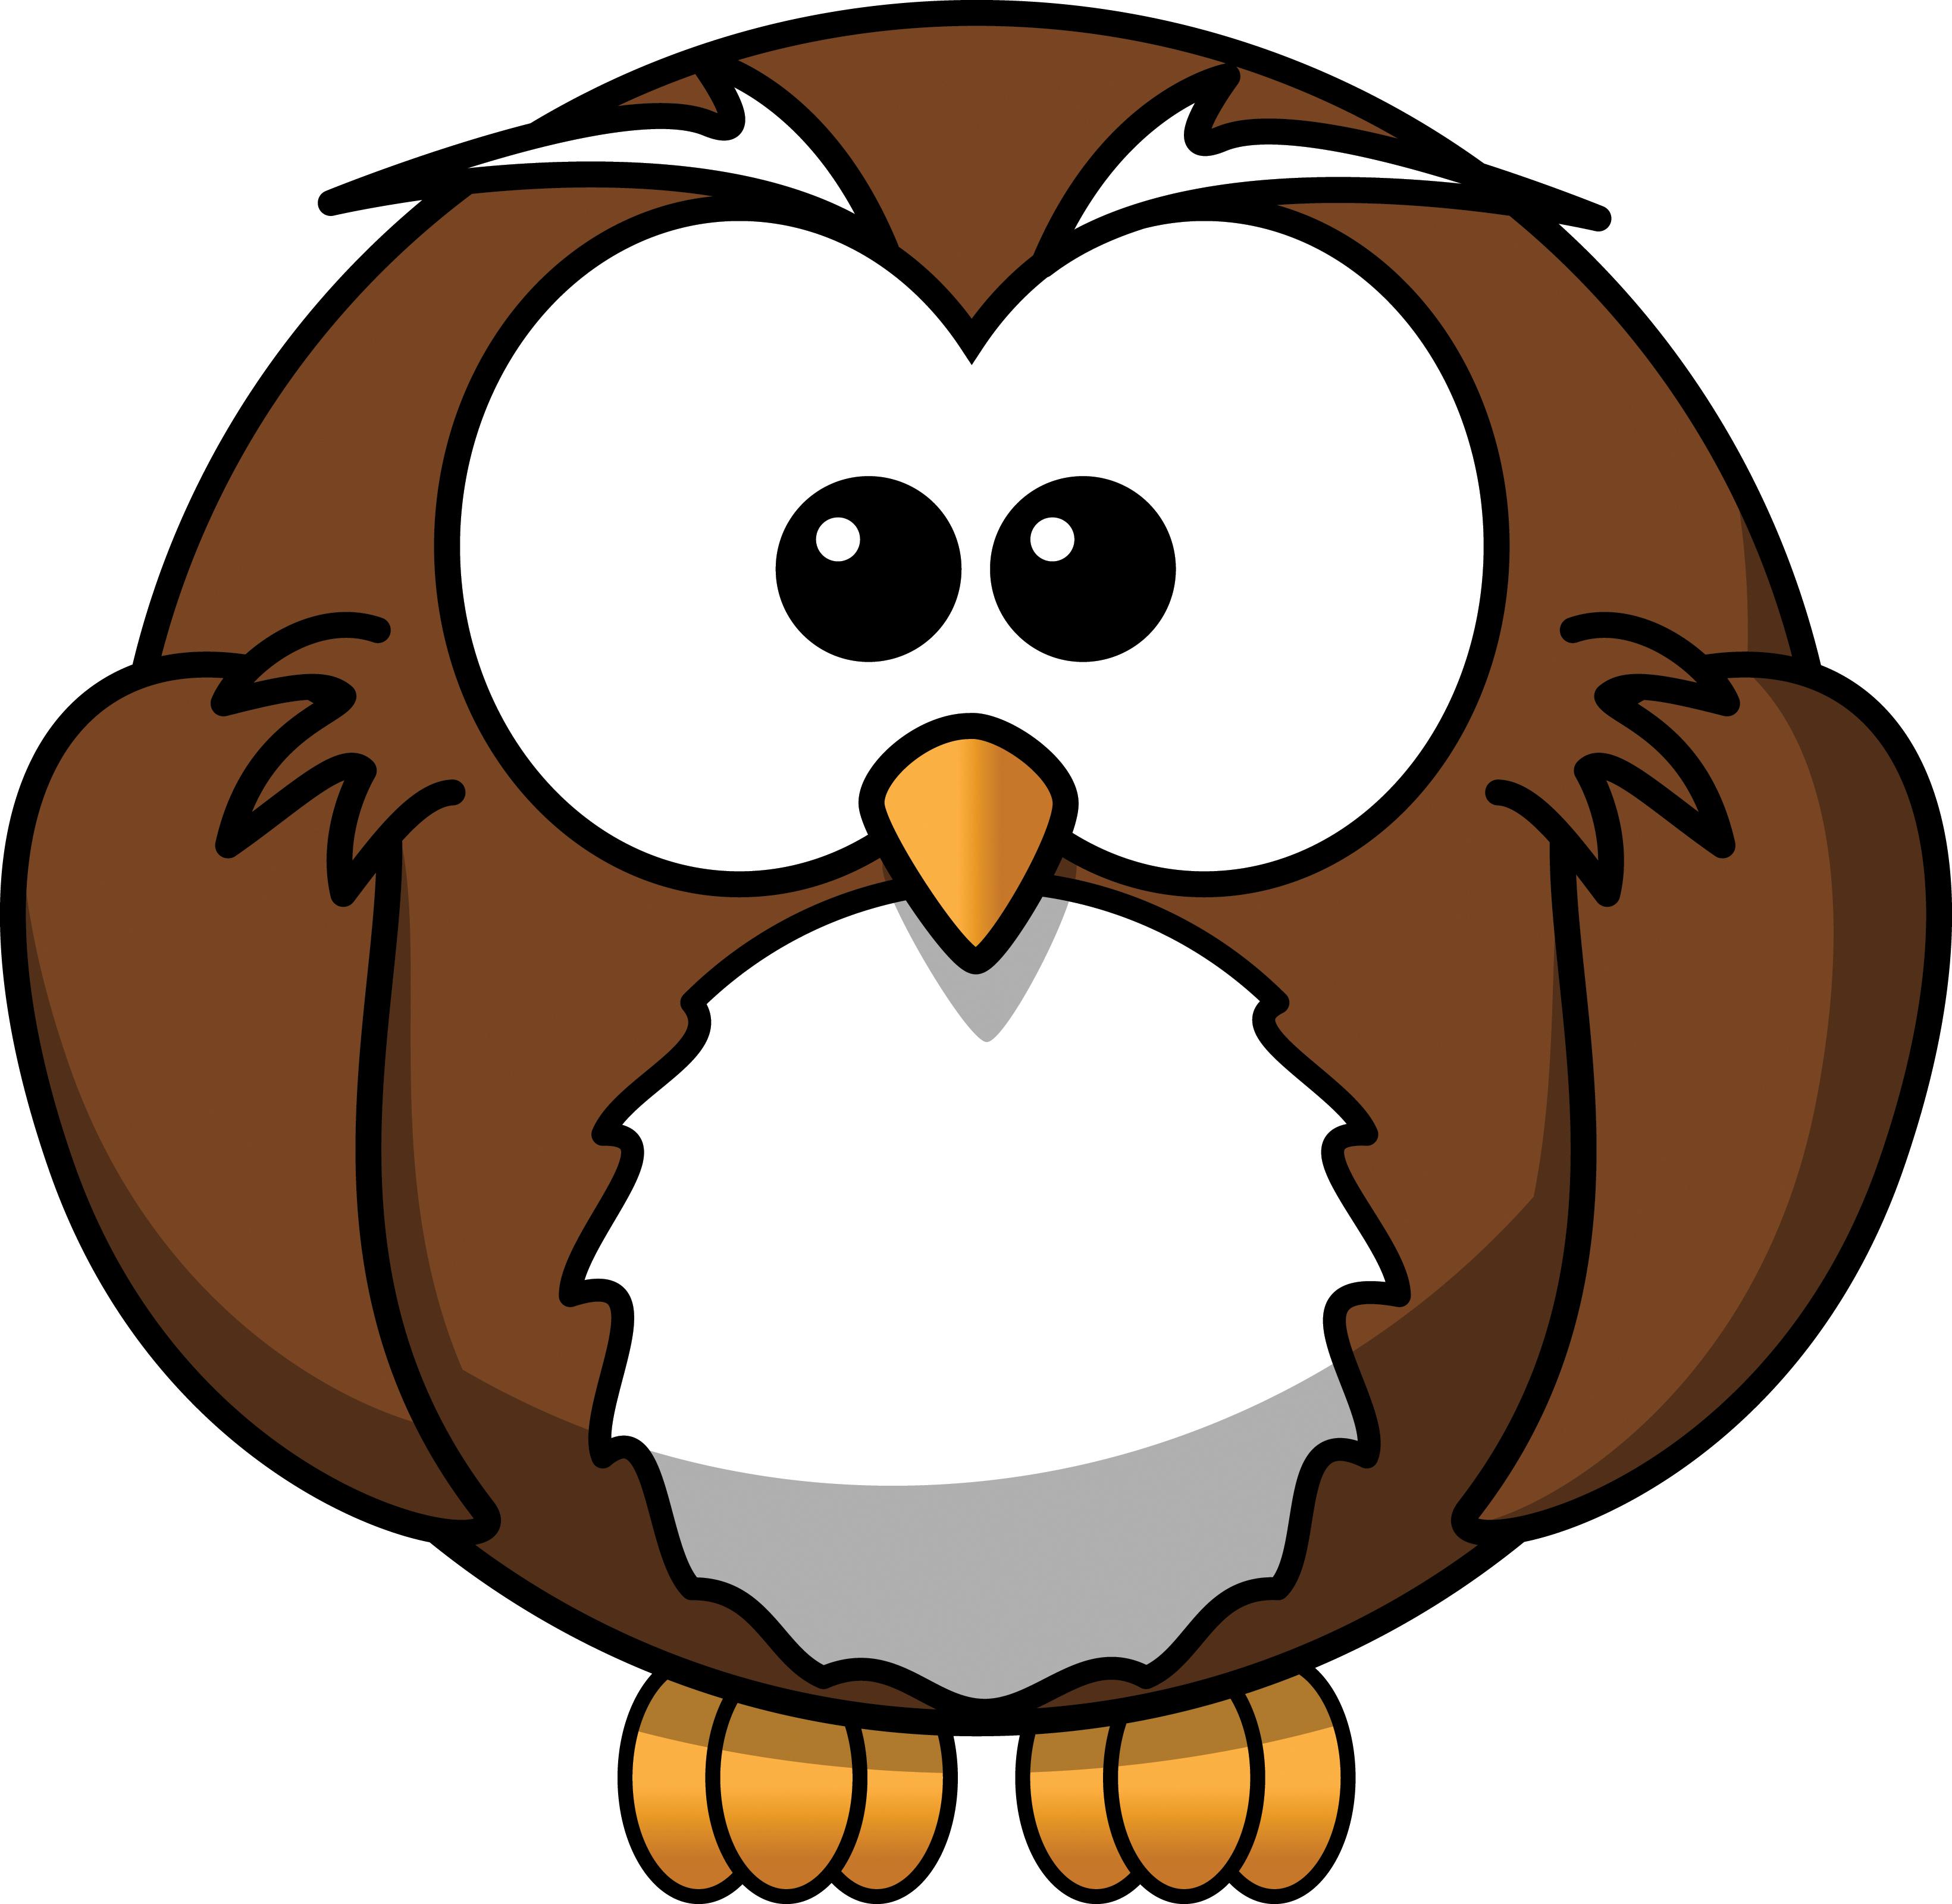 Free Cartoon Owl Clipart-Free Cartoon Owl Clipart-10